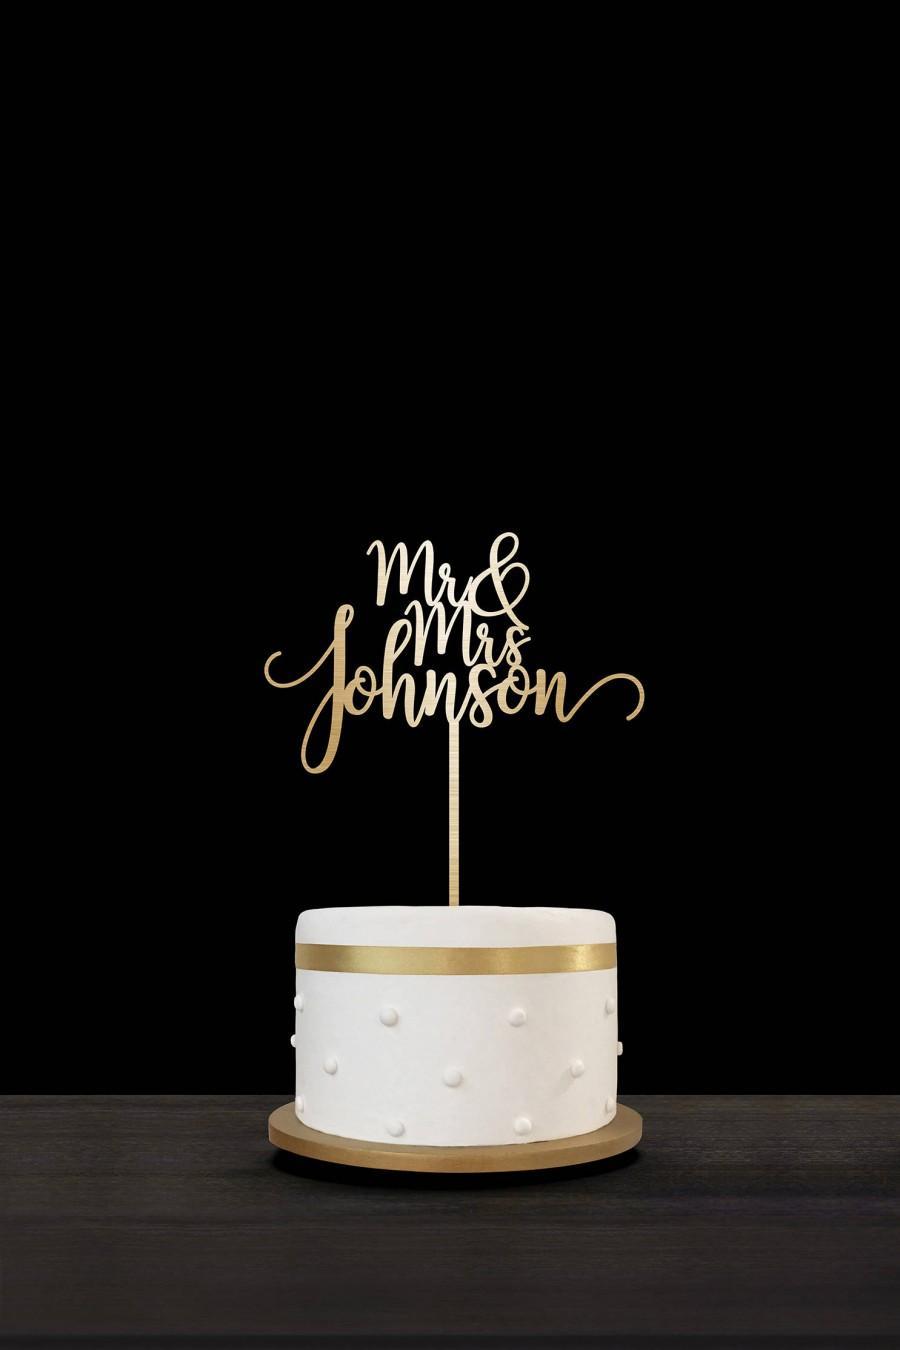 زفاف - Customized Wedding Cake Topper, Personalized Cake Topper for Wedding, Custom Personalized Wedding Cake Topper, Mr and Mrs Cake Topper 29